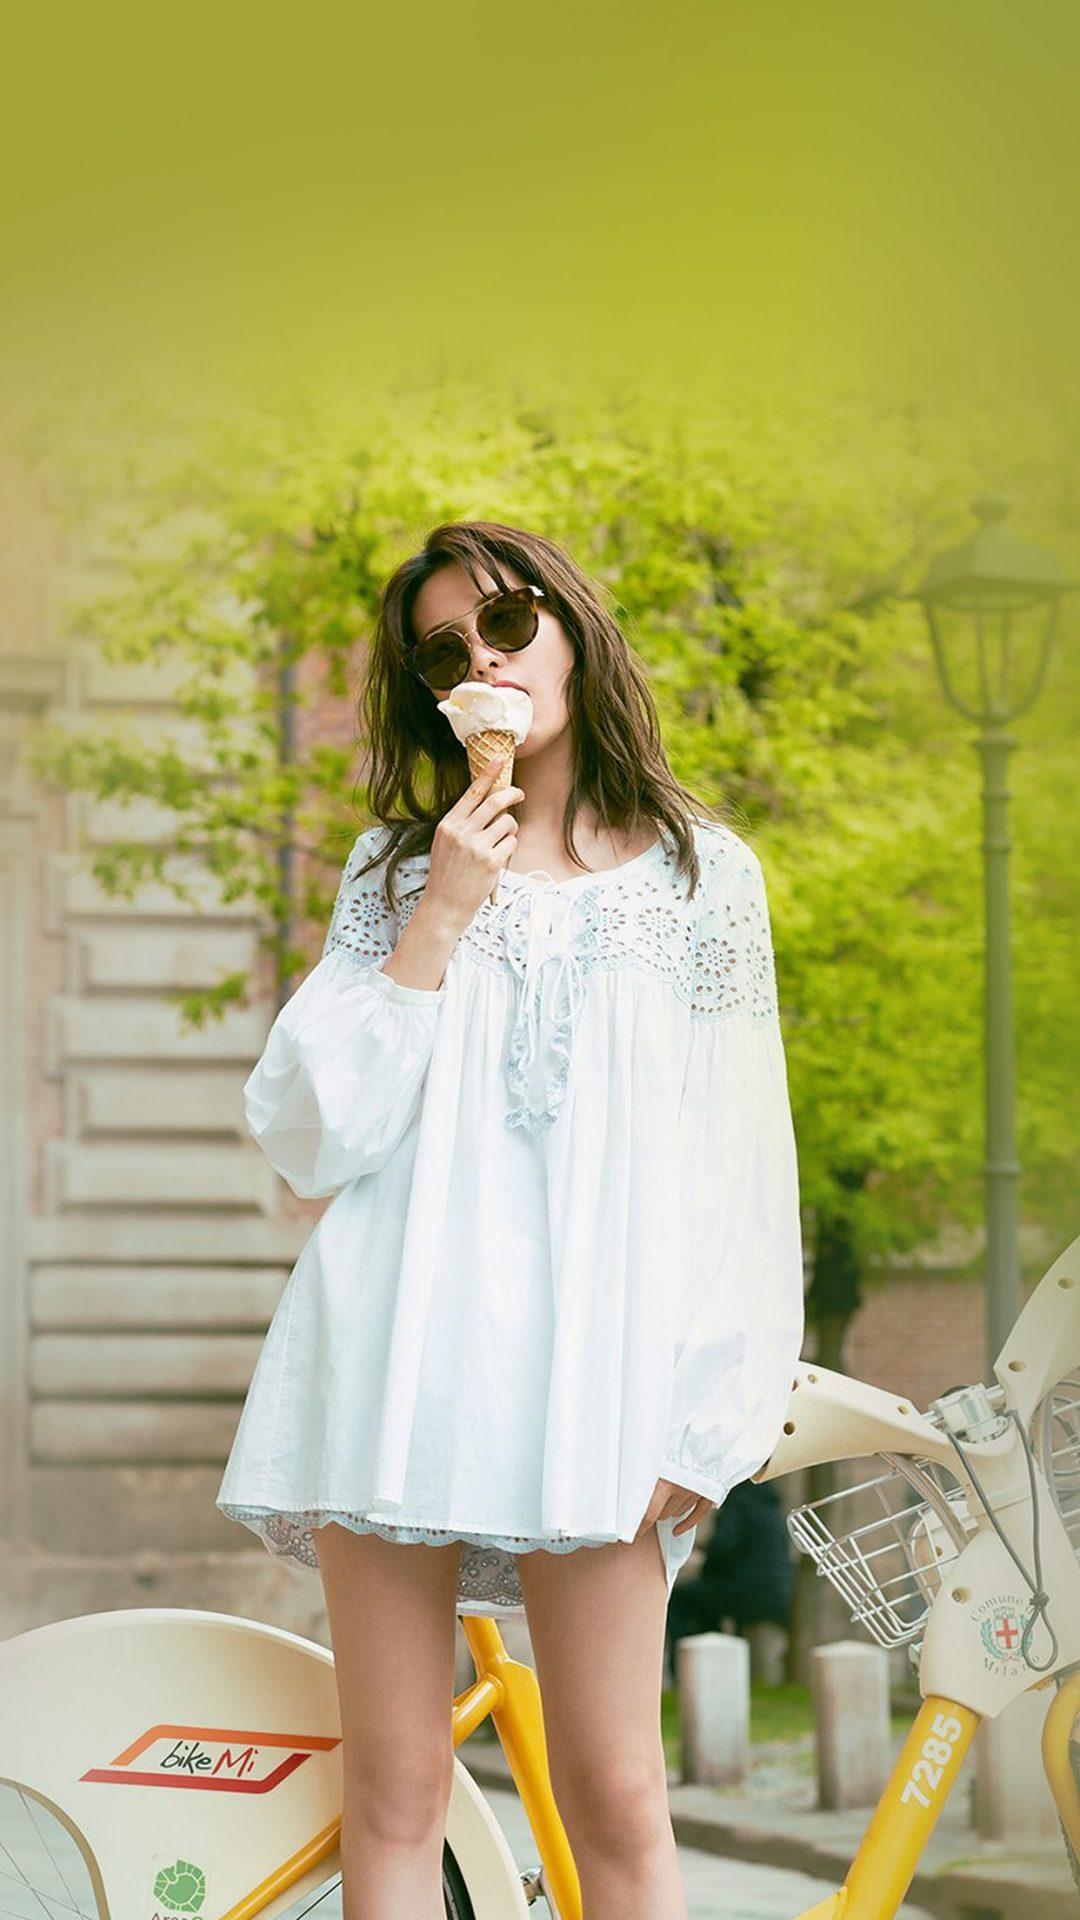 Kpop Girl Nana Icecream Spring Green